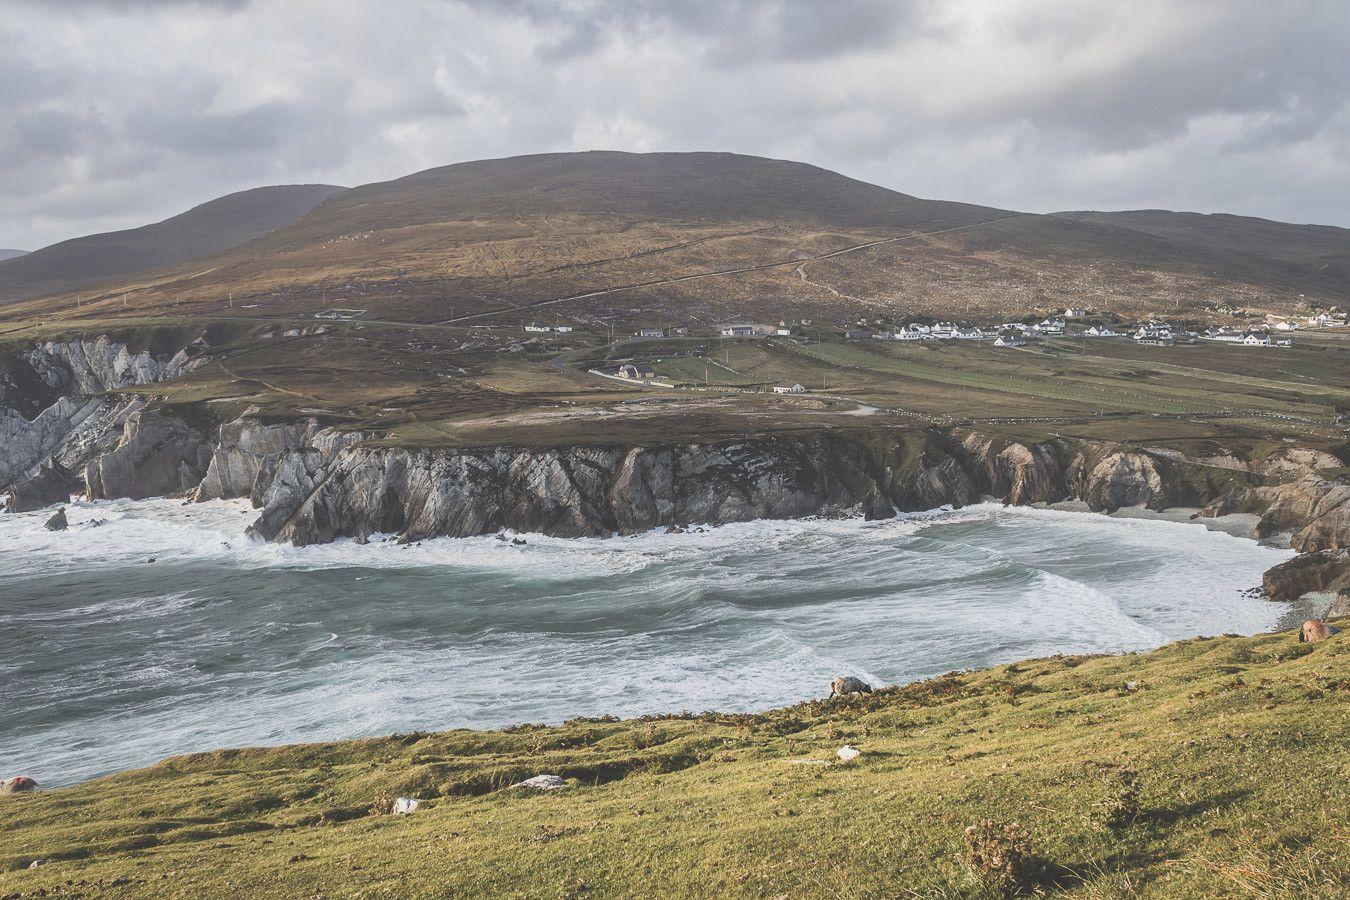 Mer agitée en Irlande sur Achill Island